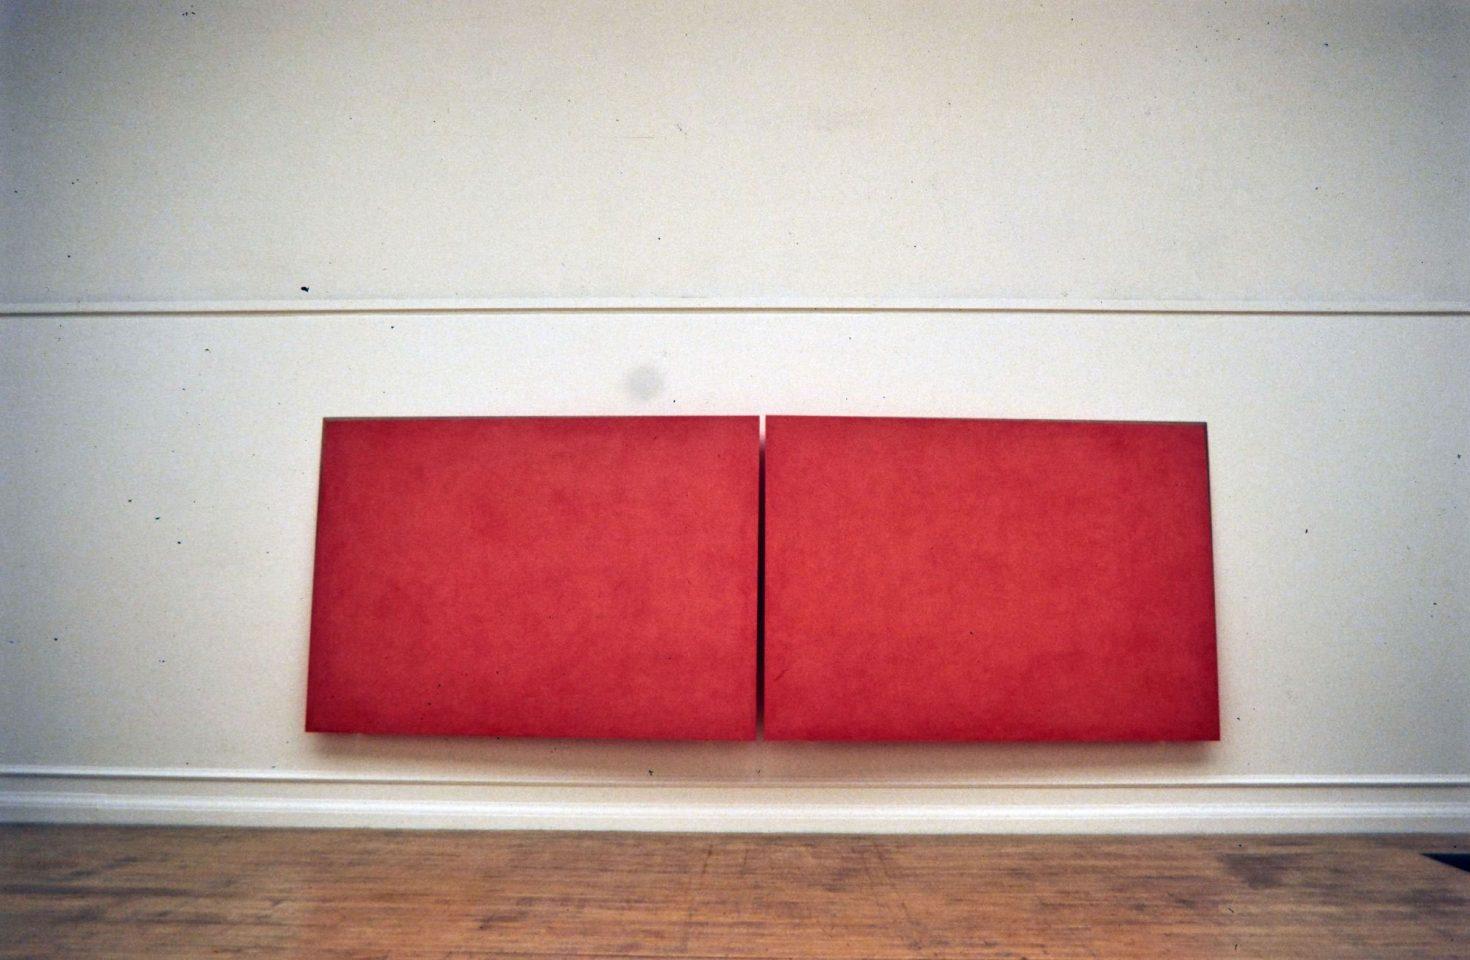 Installation view of Ettore Spalletti 1995 exhibition.